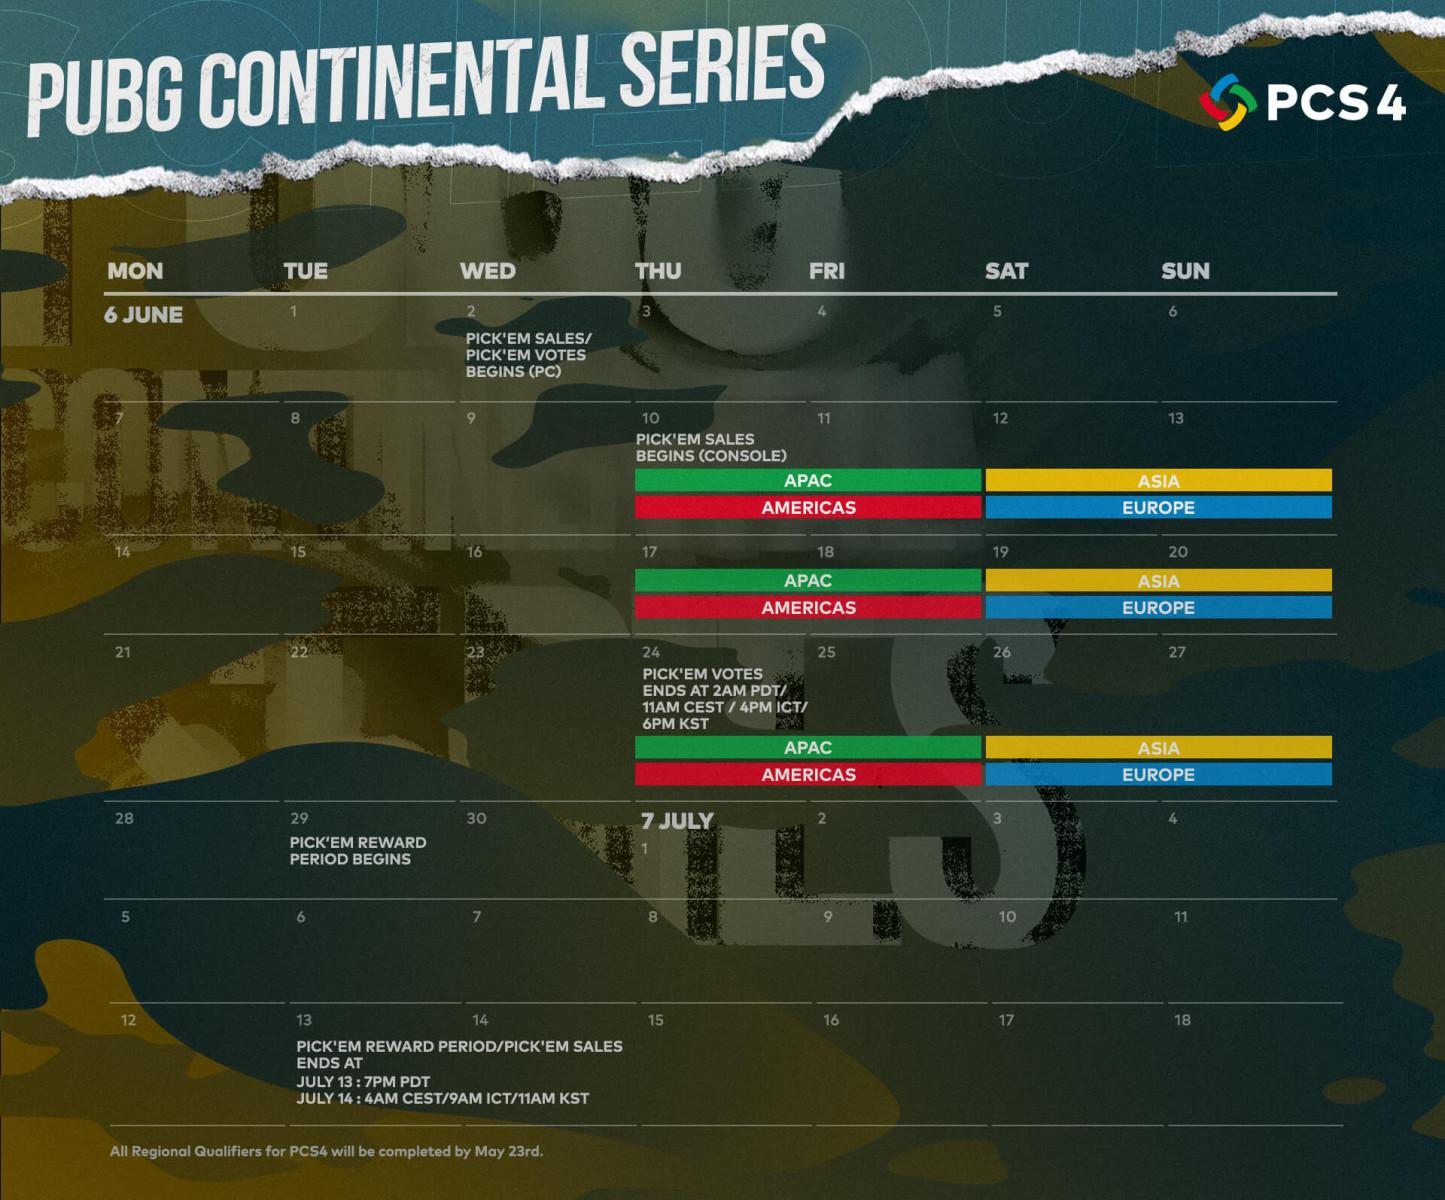 PCS4-broadcasting-schedule_fullpage.jpg